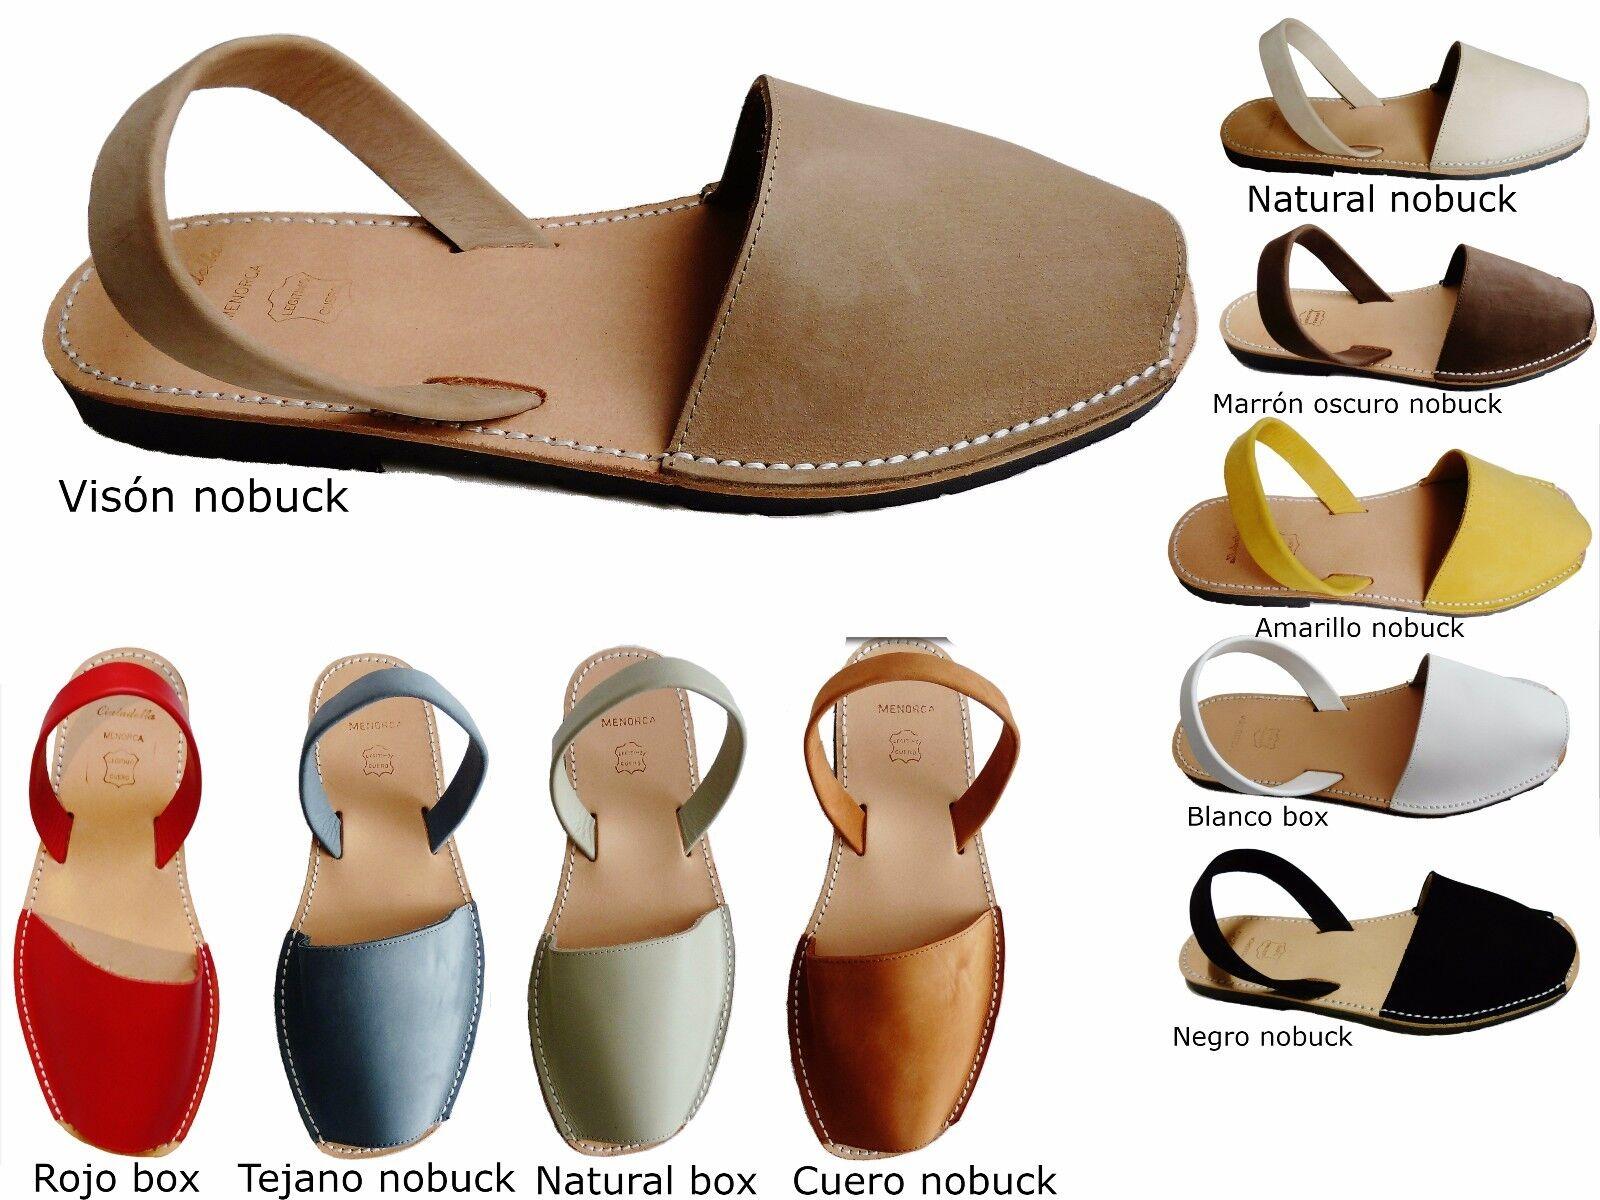 Avarcas menorquinas sizes grandes big, menorcan sandals abarcas sandalias spain